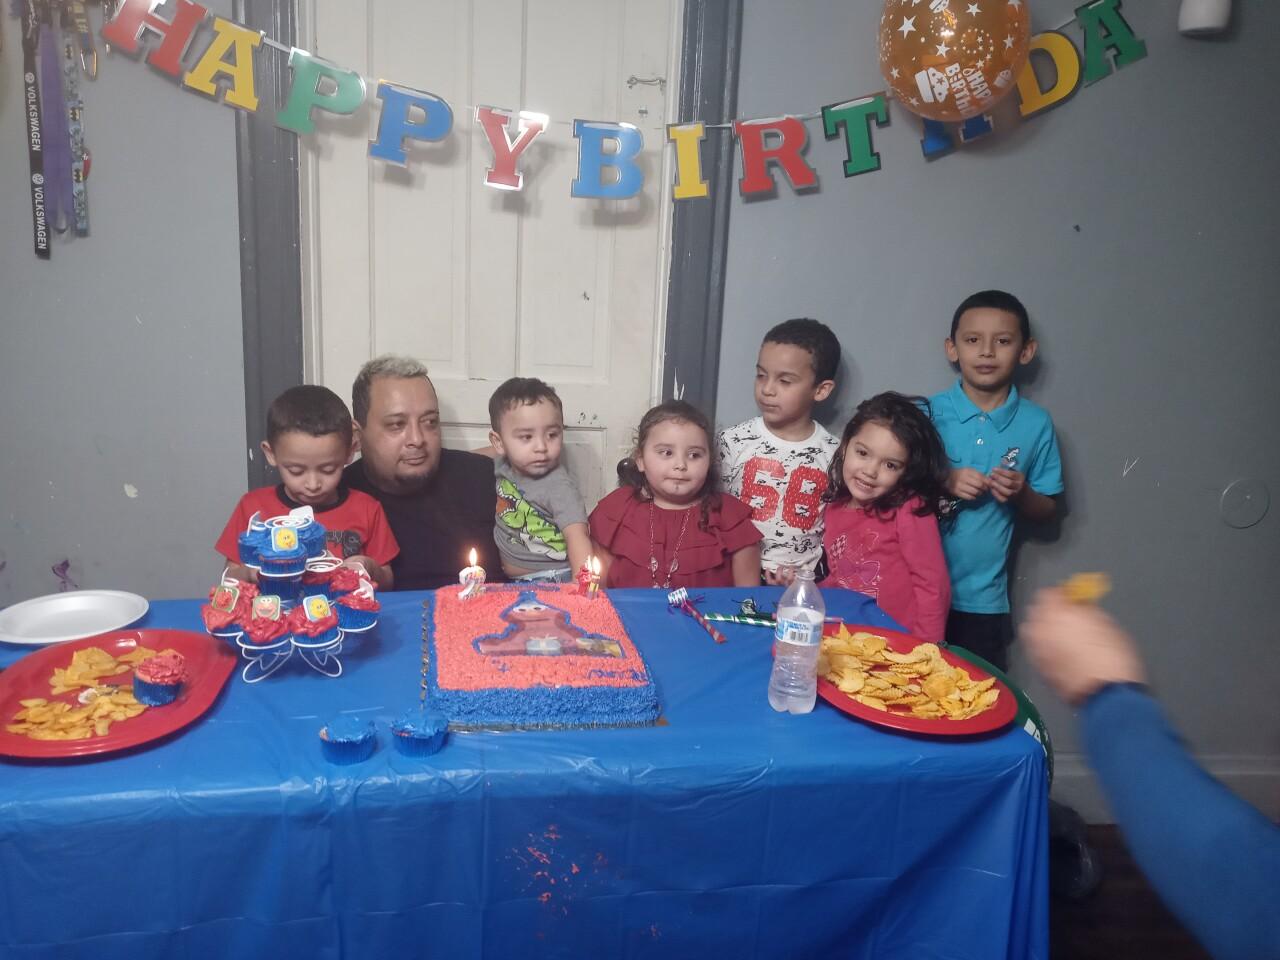 Lilliam Mejias' family